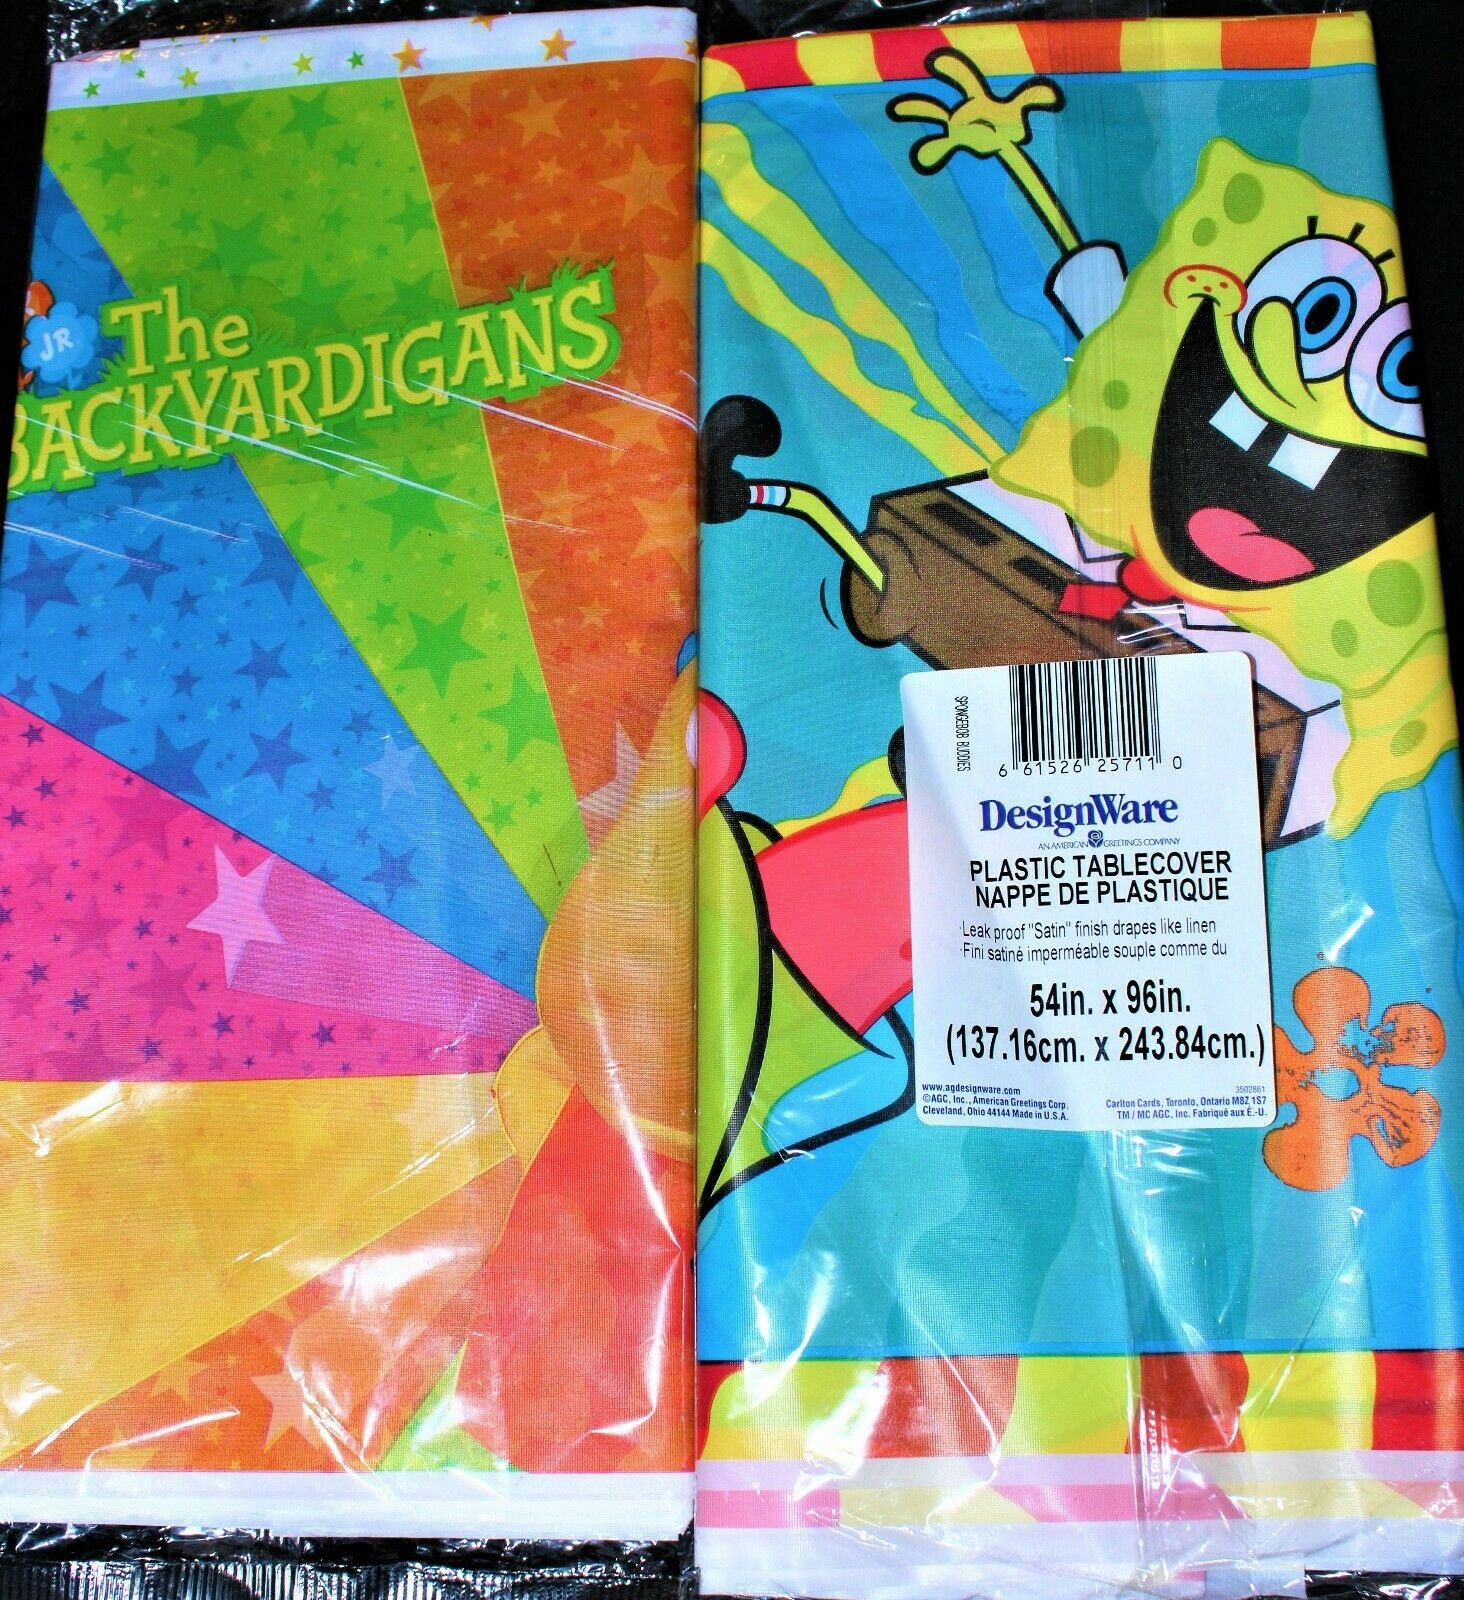 Backyardigans DesignWare Plastic Tablecover Tablecloth Birthday Party New 54x96